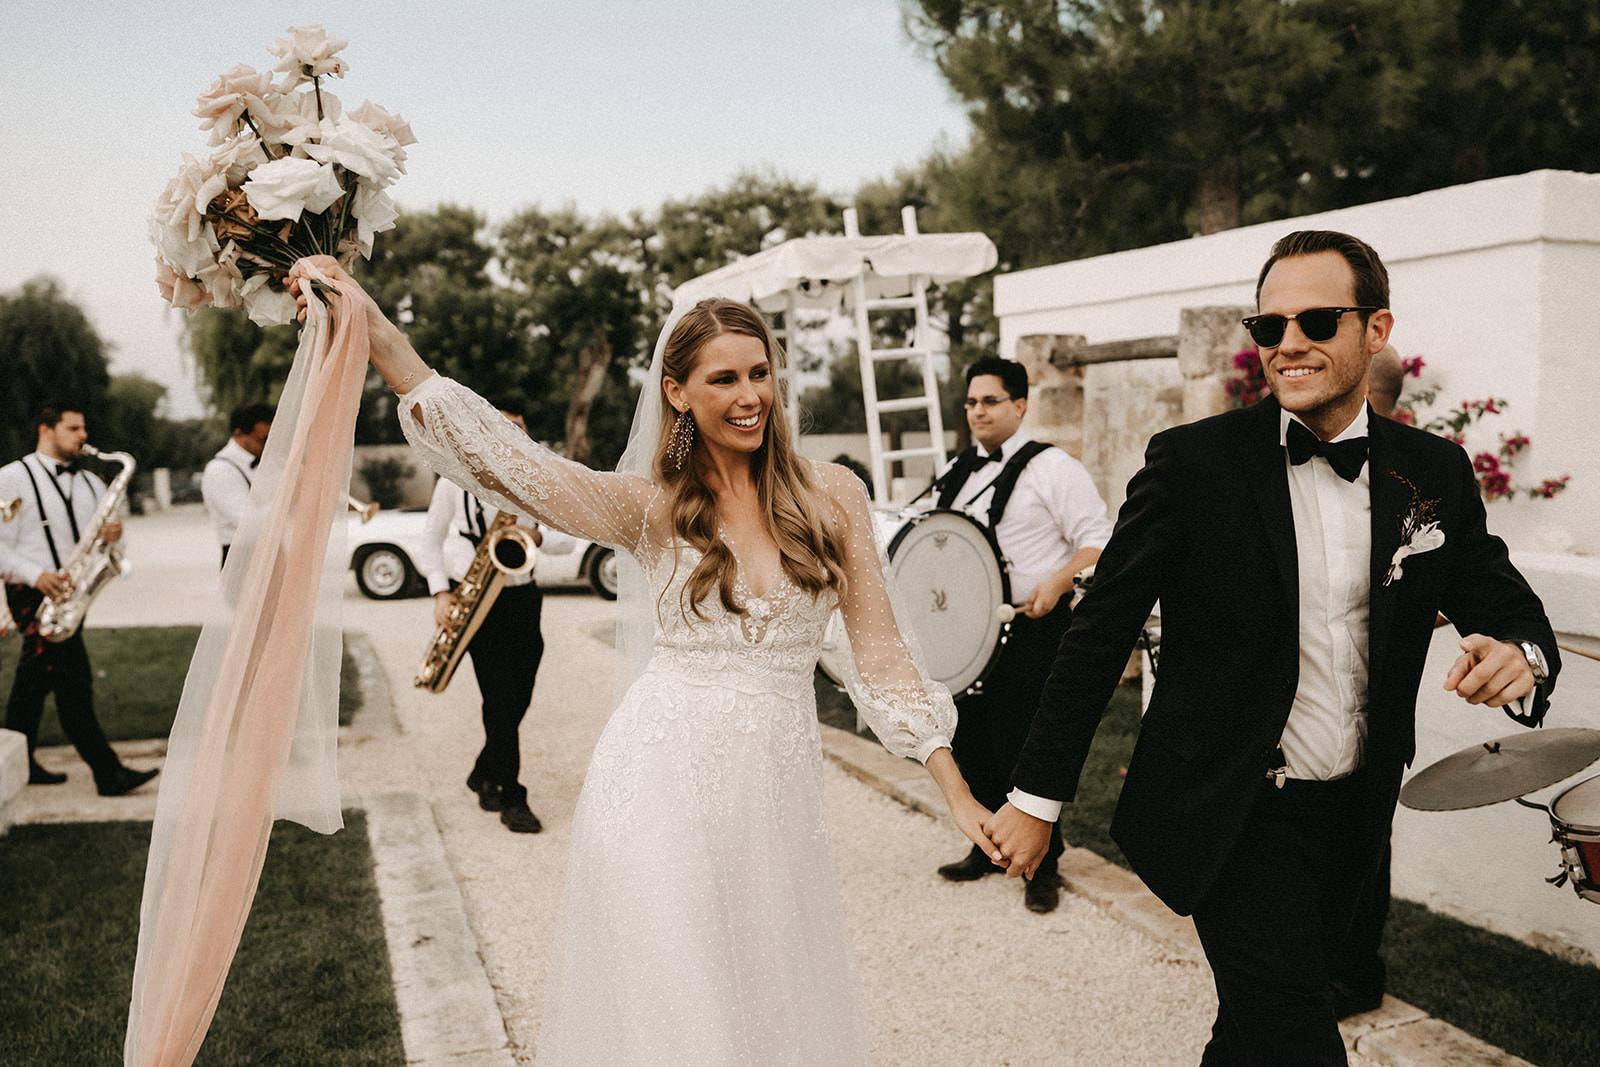 puglia, wedding, couple, music